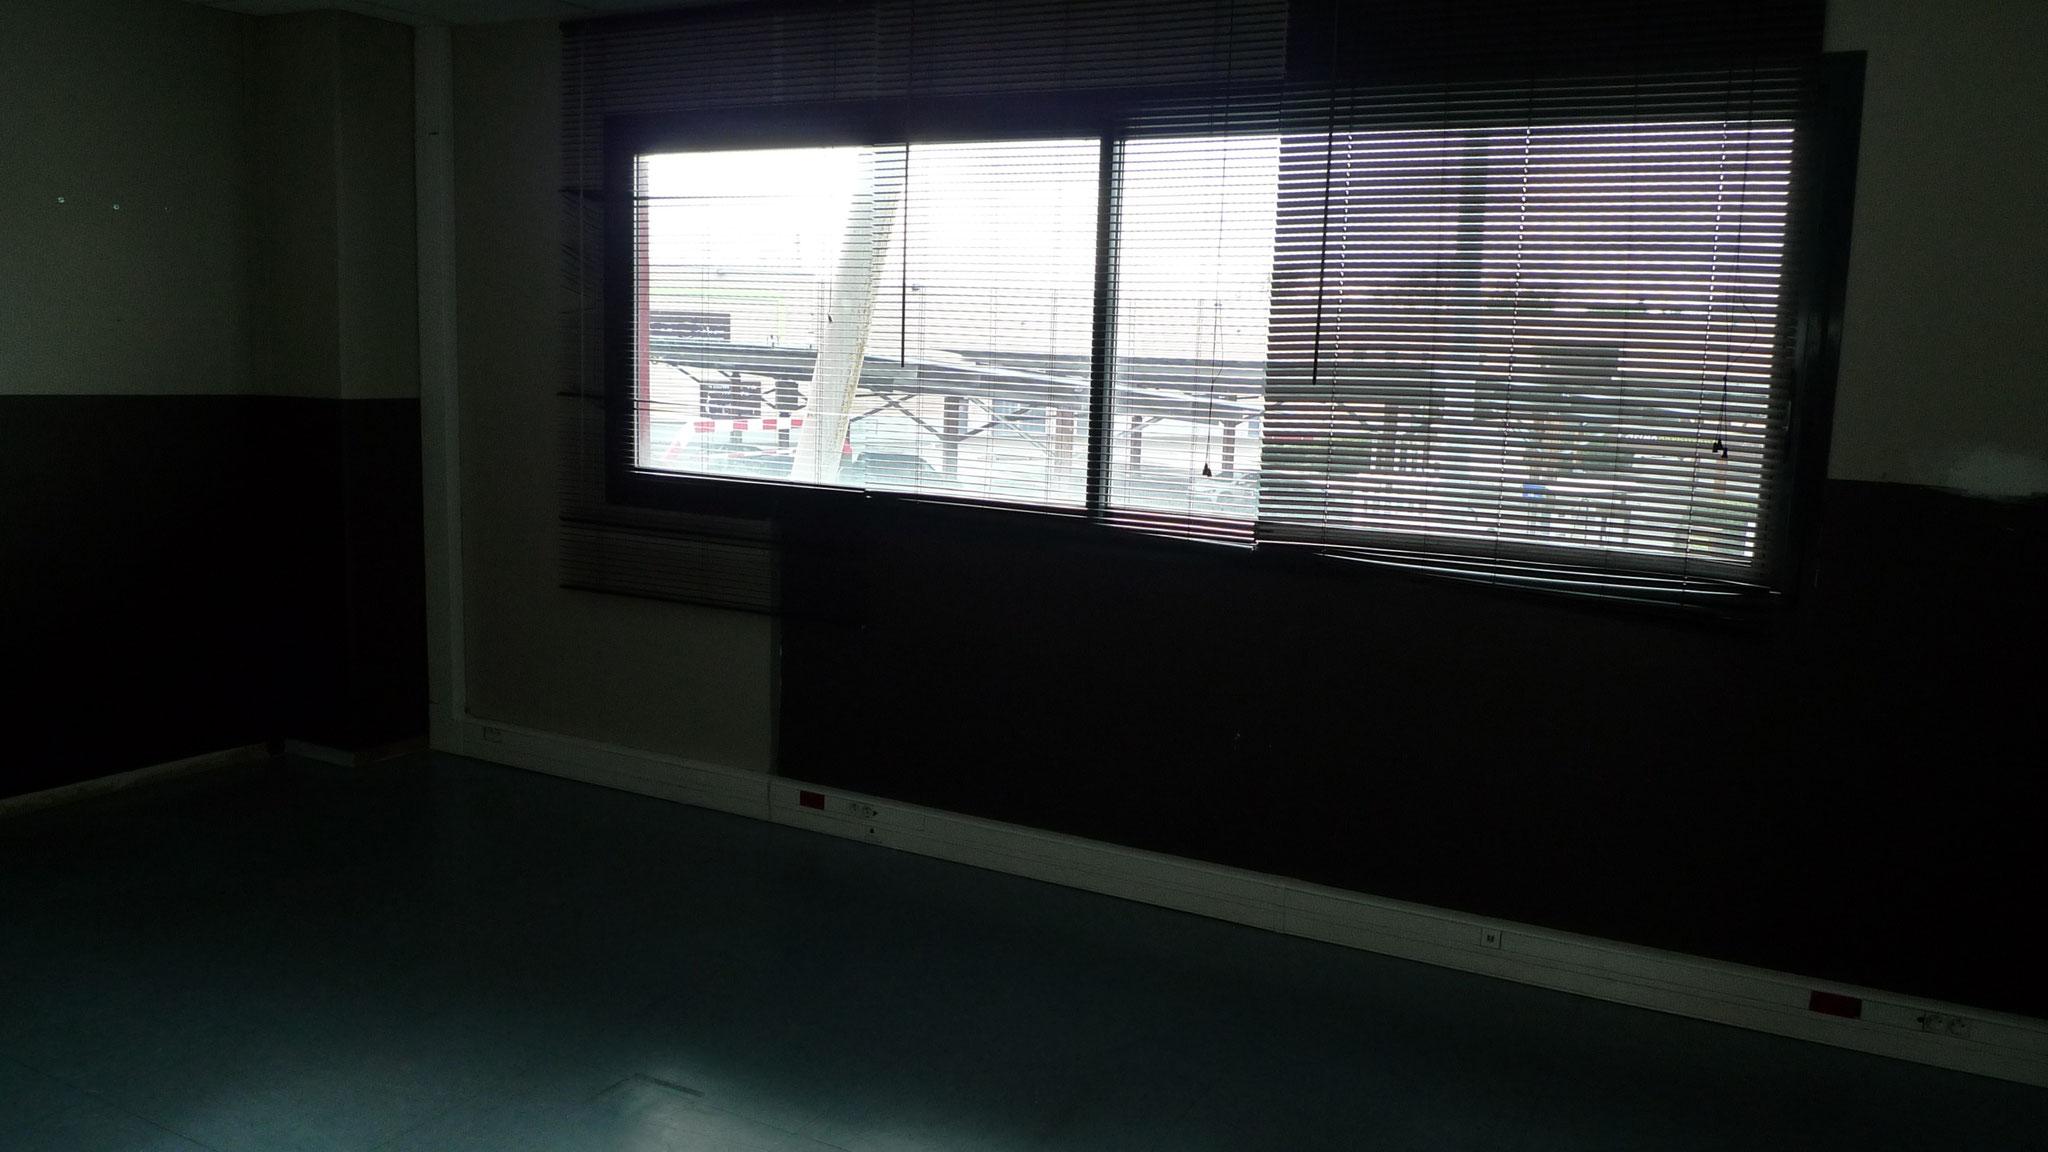 Vaucluse bureaux 84 a vendre immobilier vente achat for Agence immobiliere 84